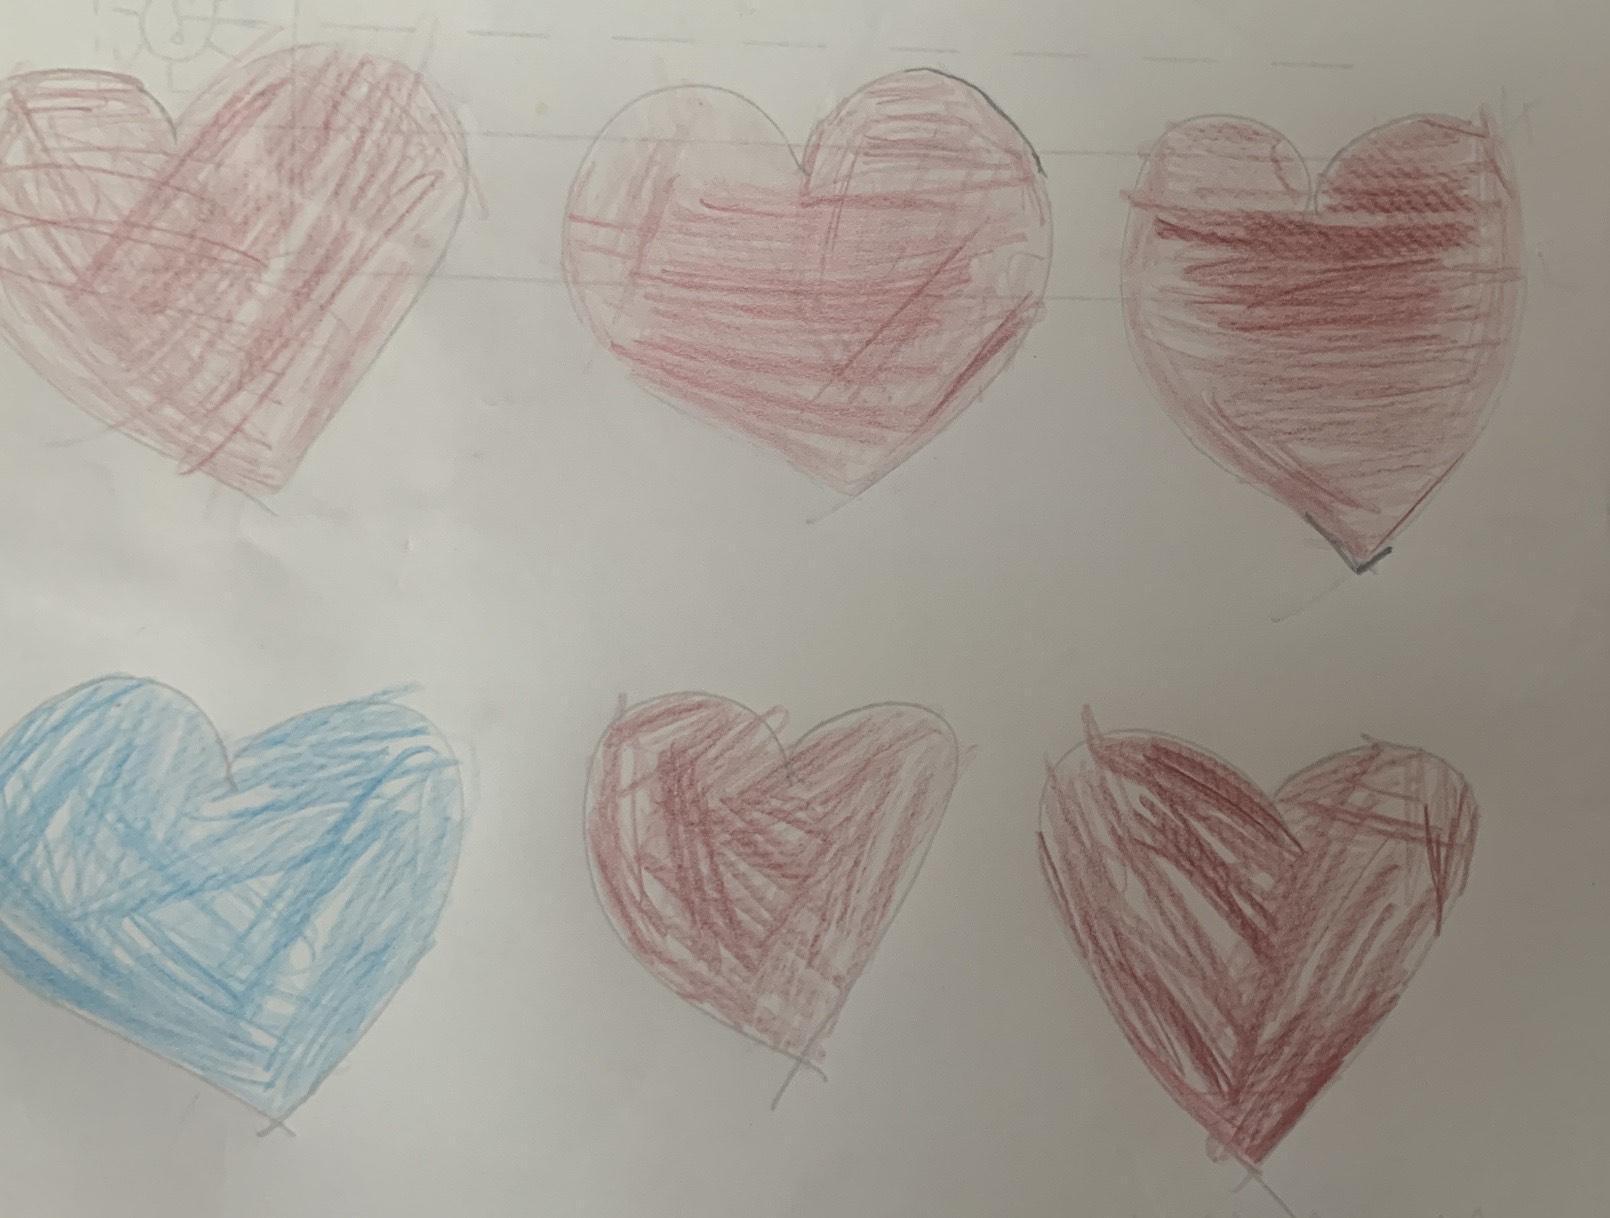 K-7 Work of heart photos